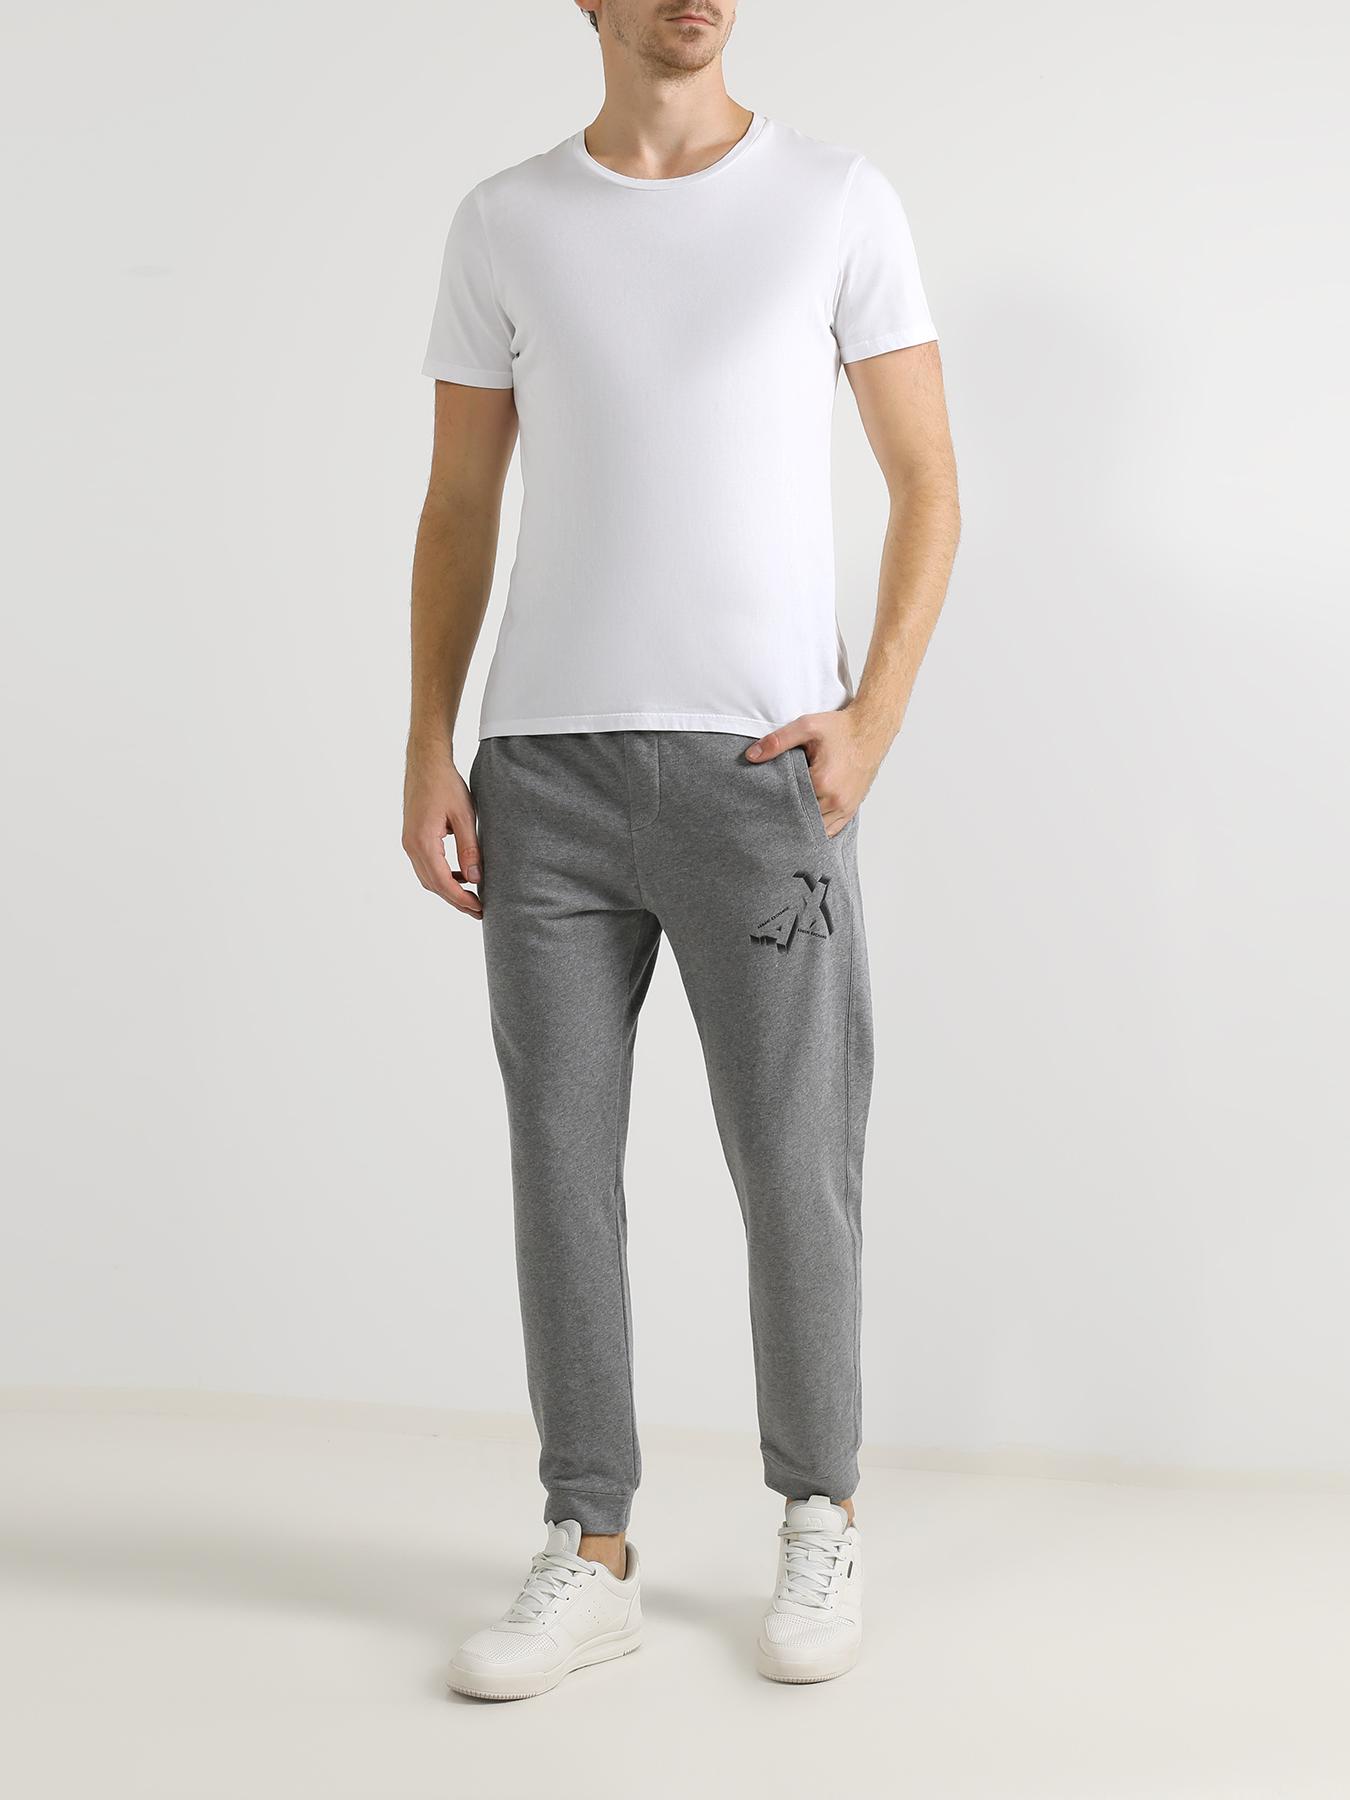 Брюки Armani Exchange Спортивные брюки брюки спортивные columbia columbia anytime outdoor boot cut pant